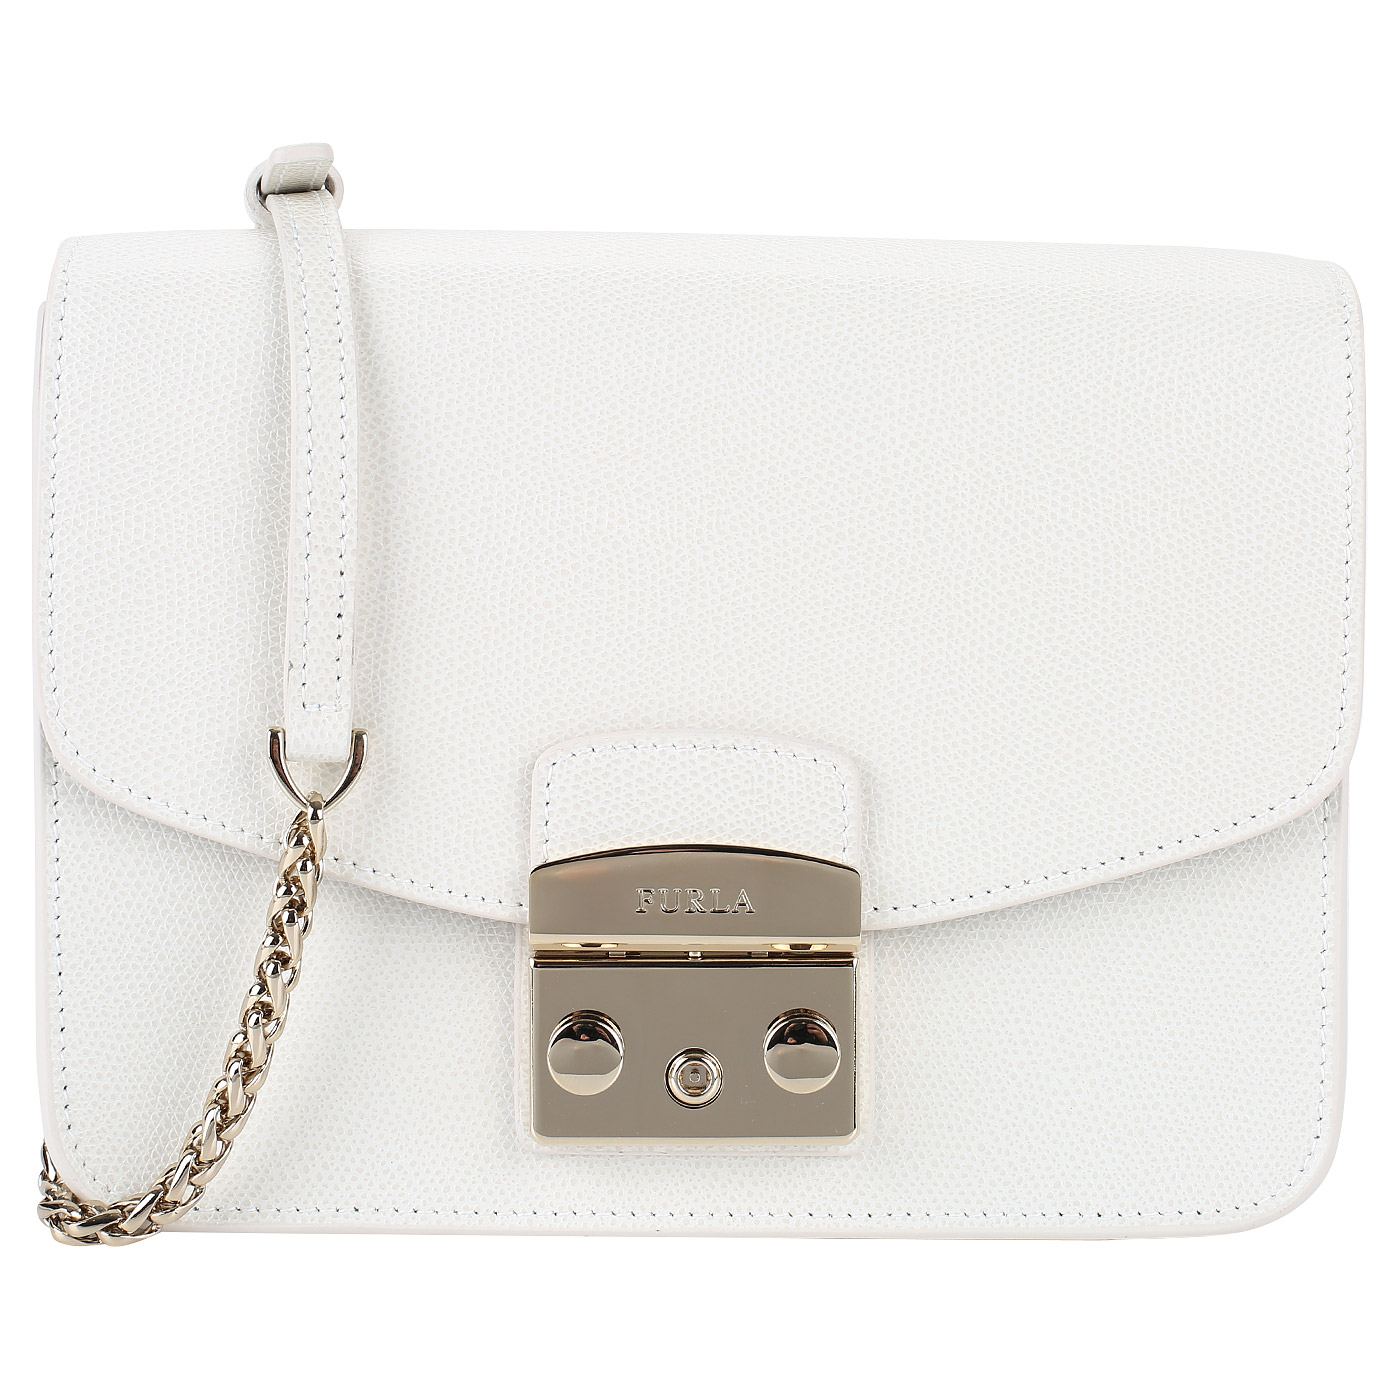 78fb89e7ada5 Женская белая сумочка Furla Metropolis BNF8_petalo - 2000557845237 ...